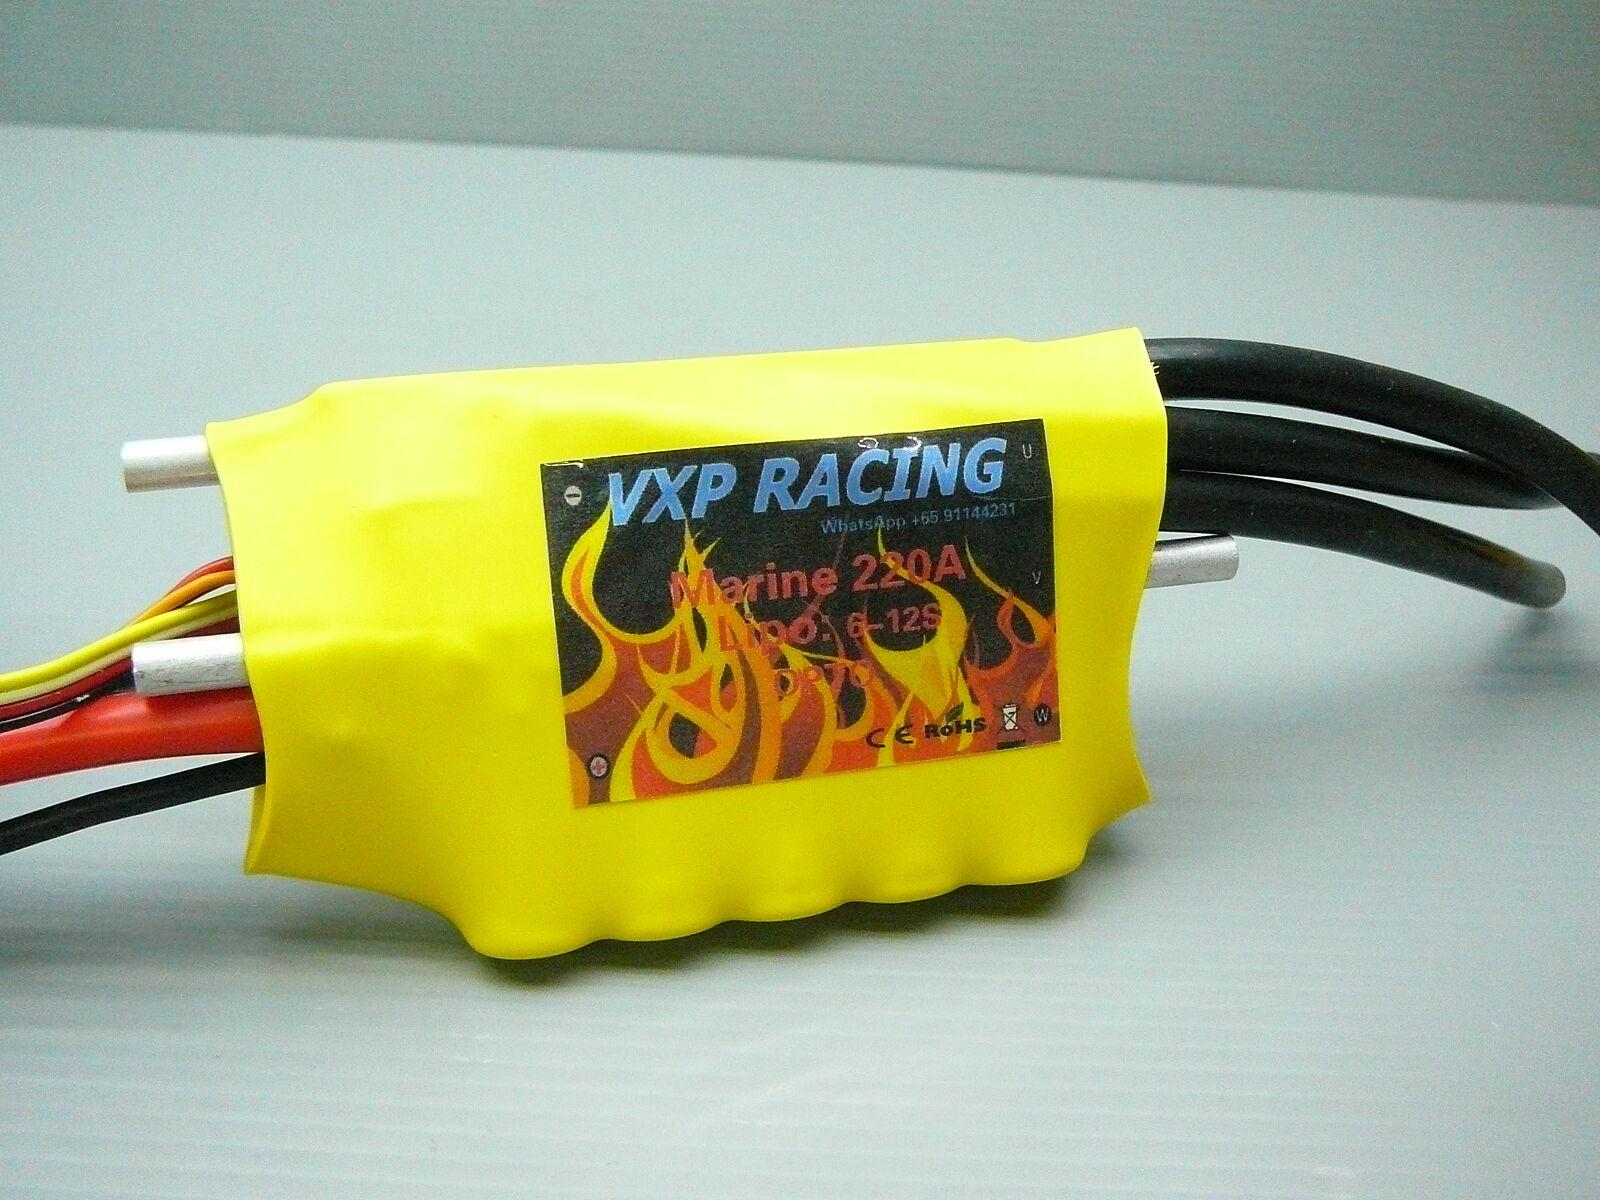 VXP Racing 220A ESC High Voltage 6-12S LiPo Boat beats Hobbywing Sea King 180A